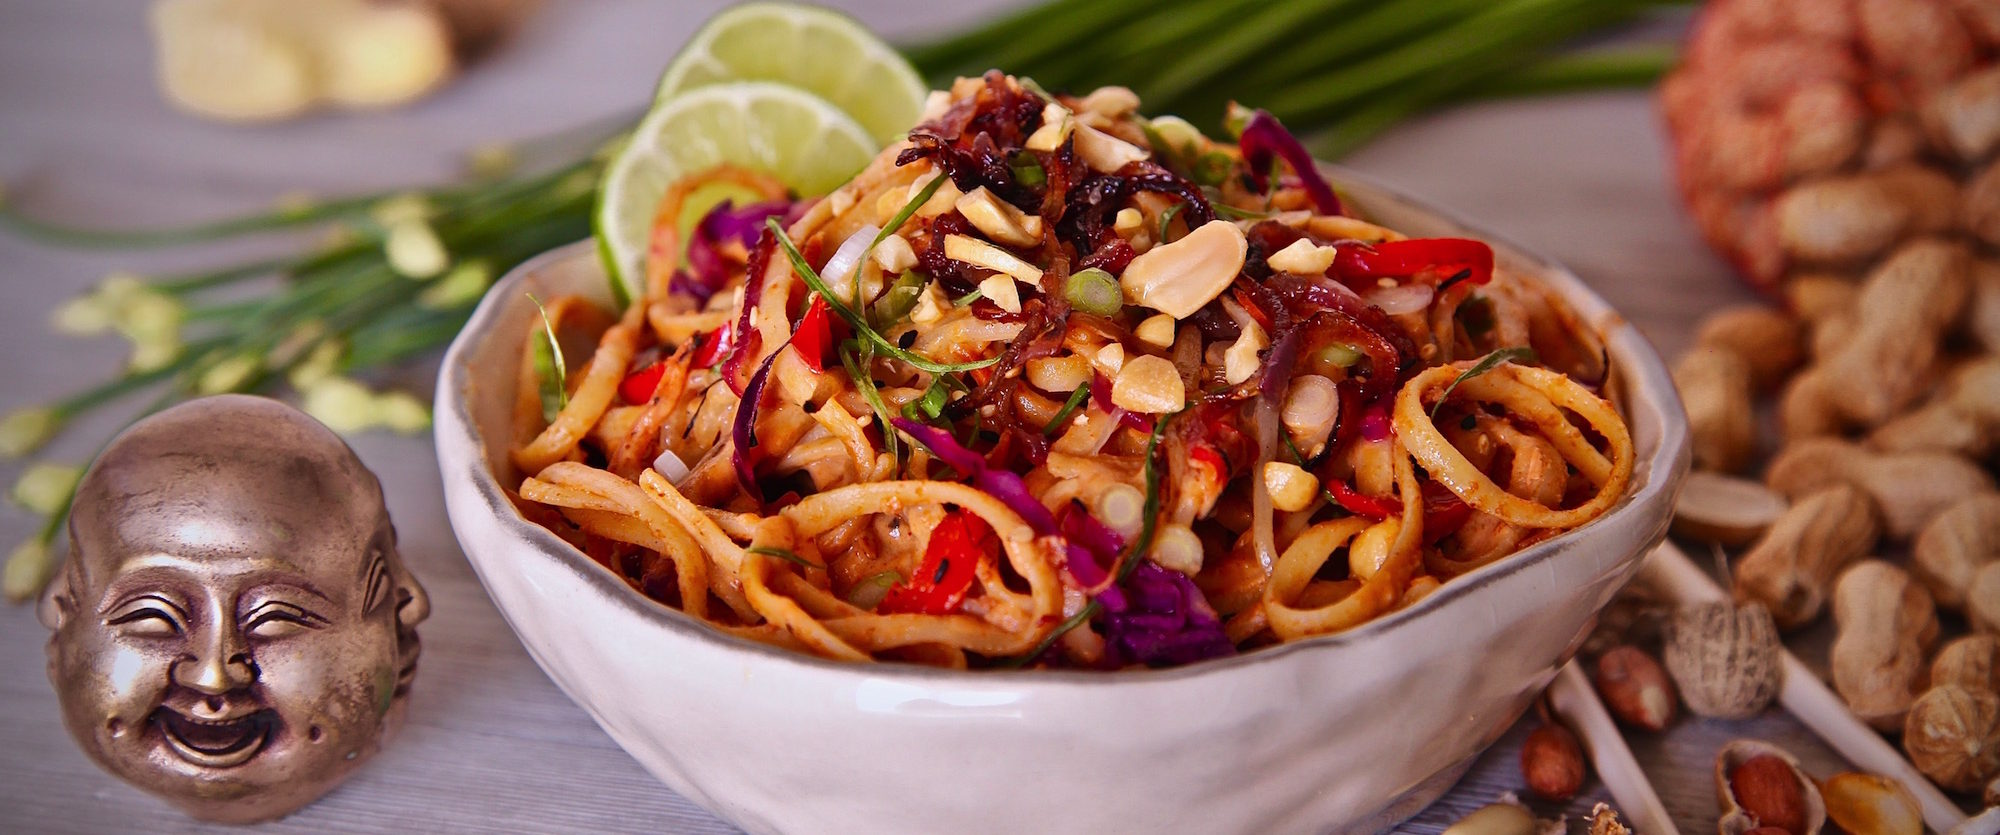 Spicy Peanut Sauce Noodles: Perfect for Vegans